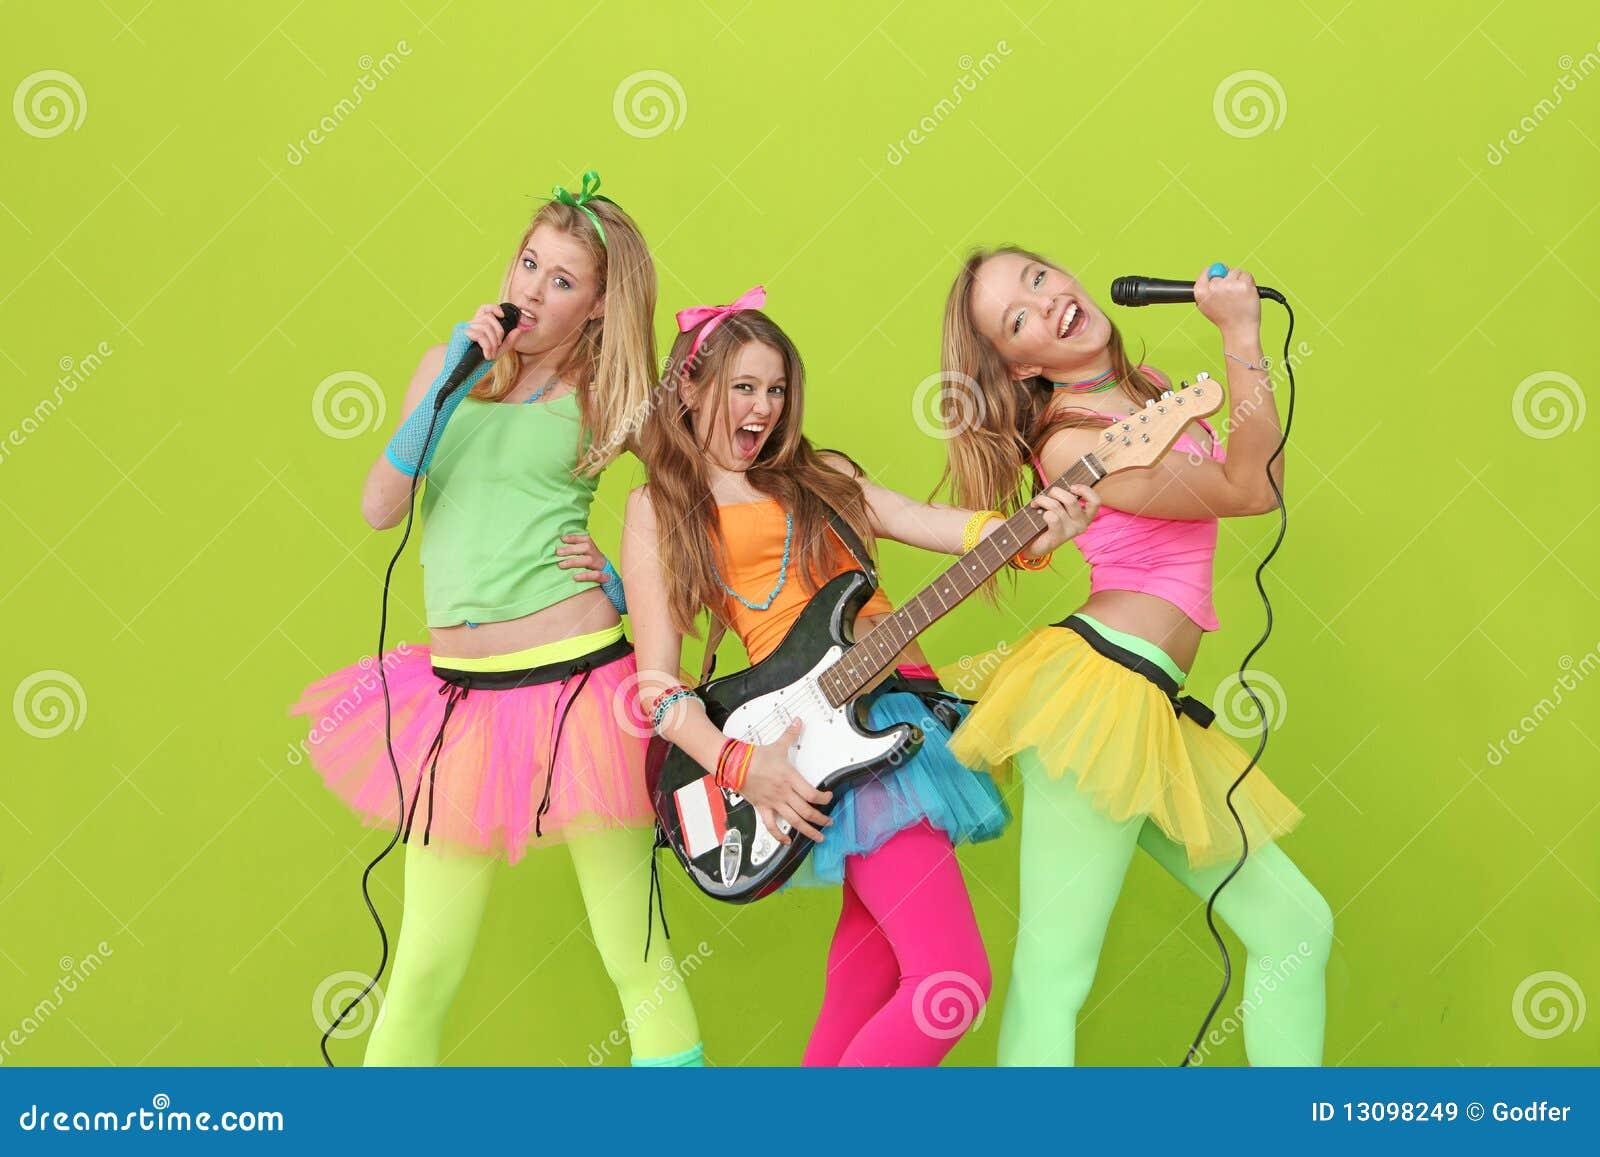 Cantores adolescentes do karaoke com guitarra e micro